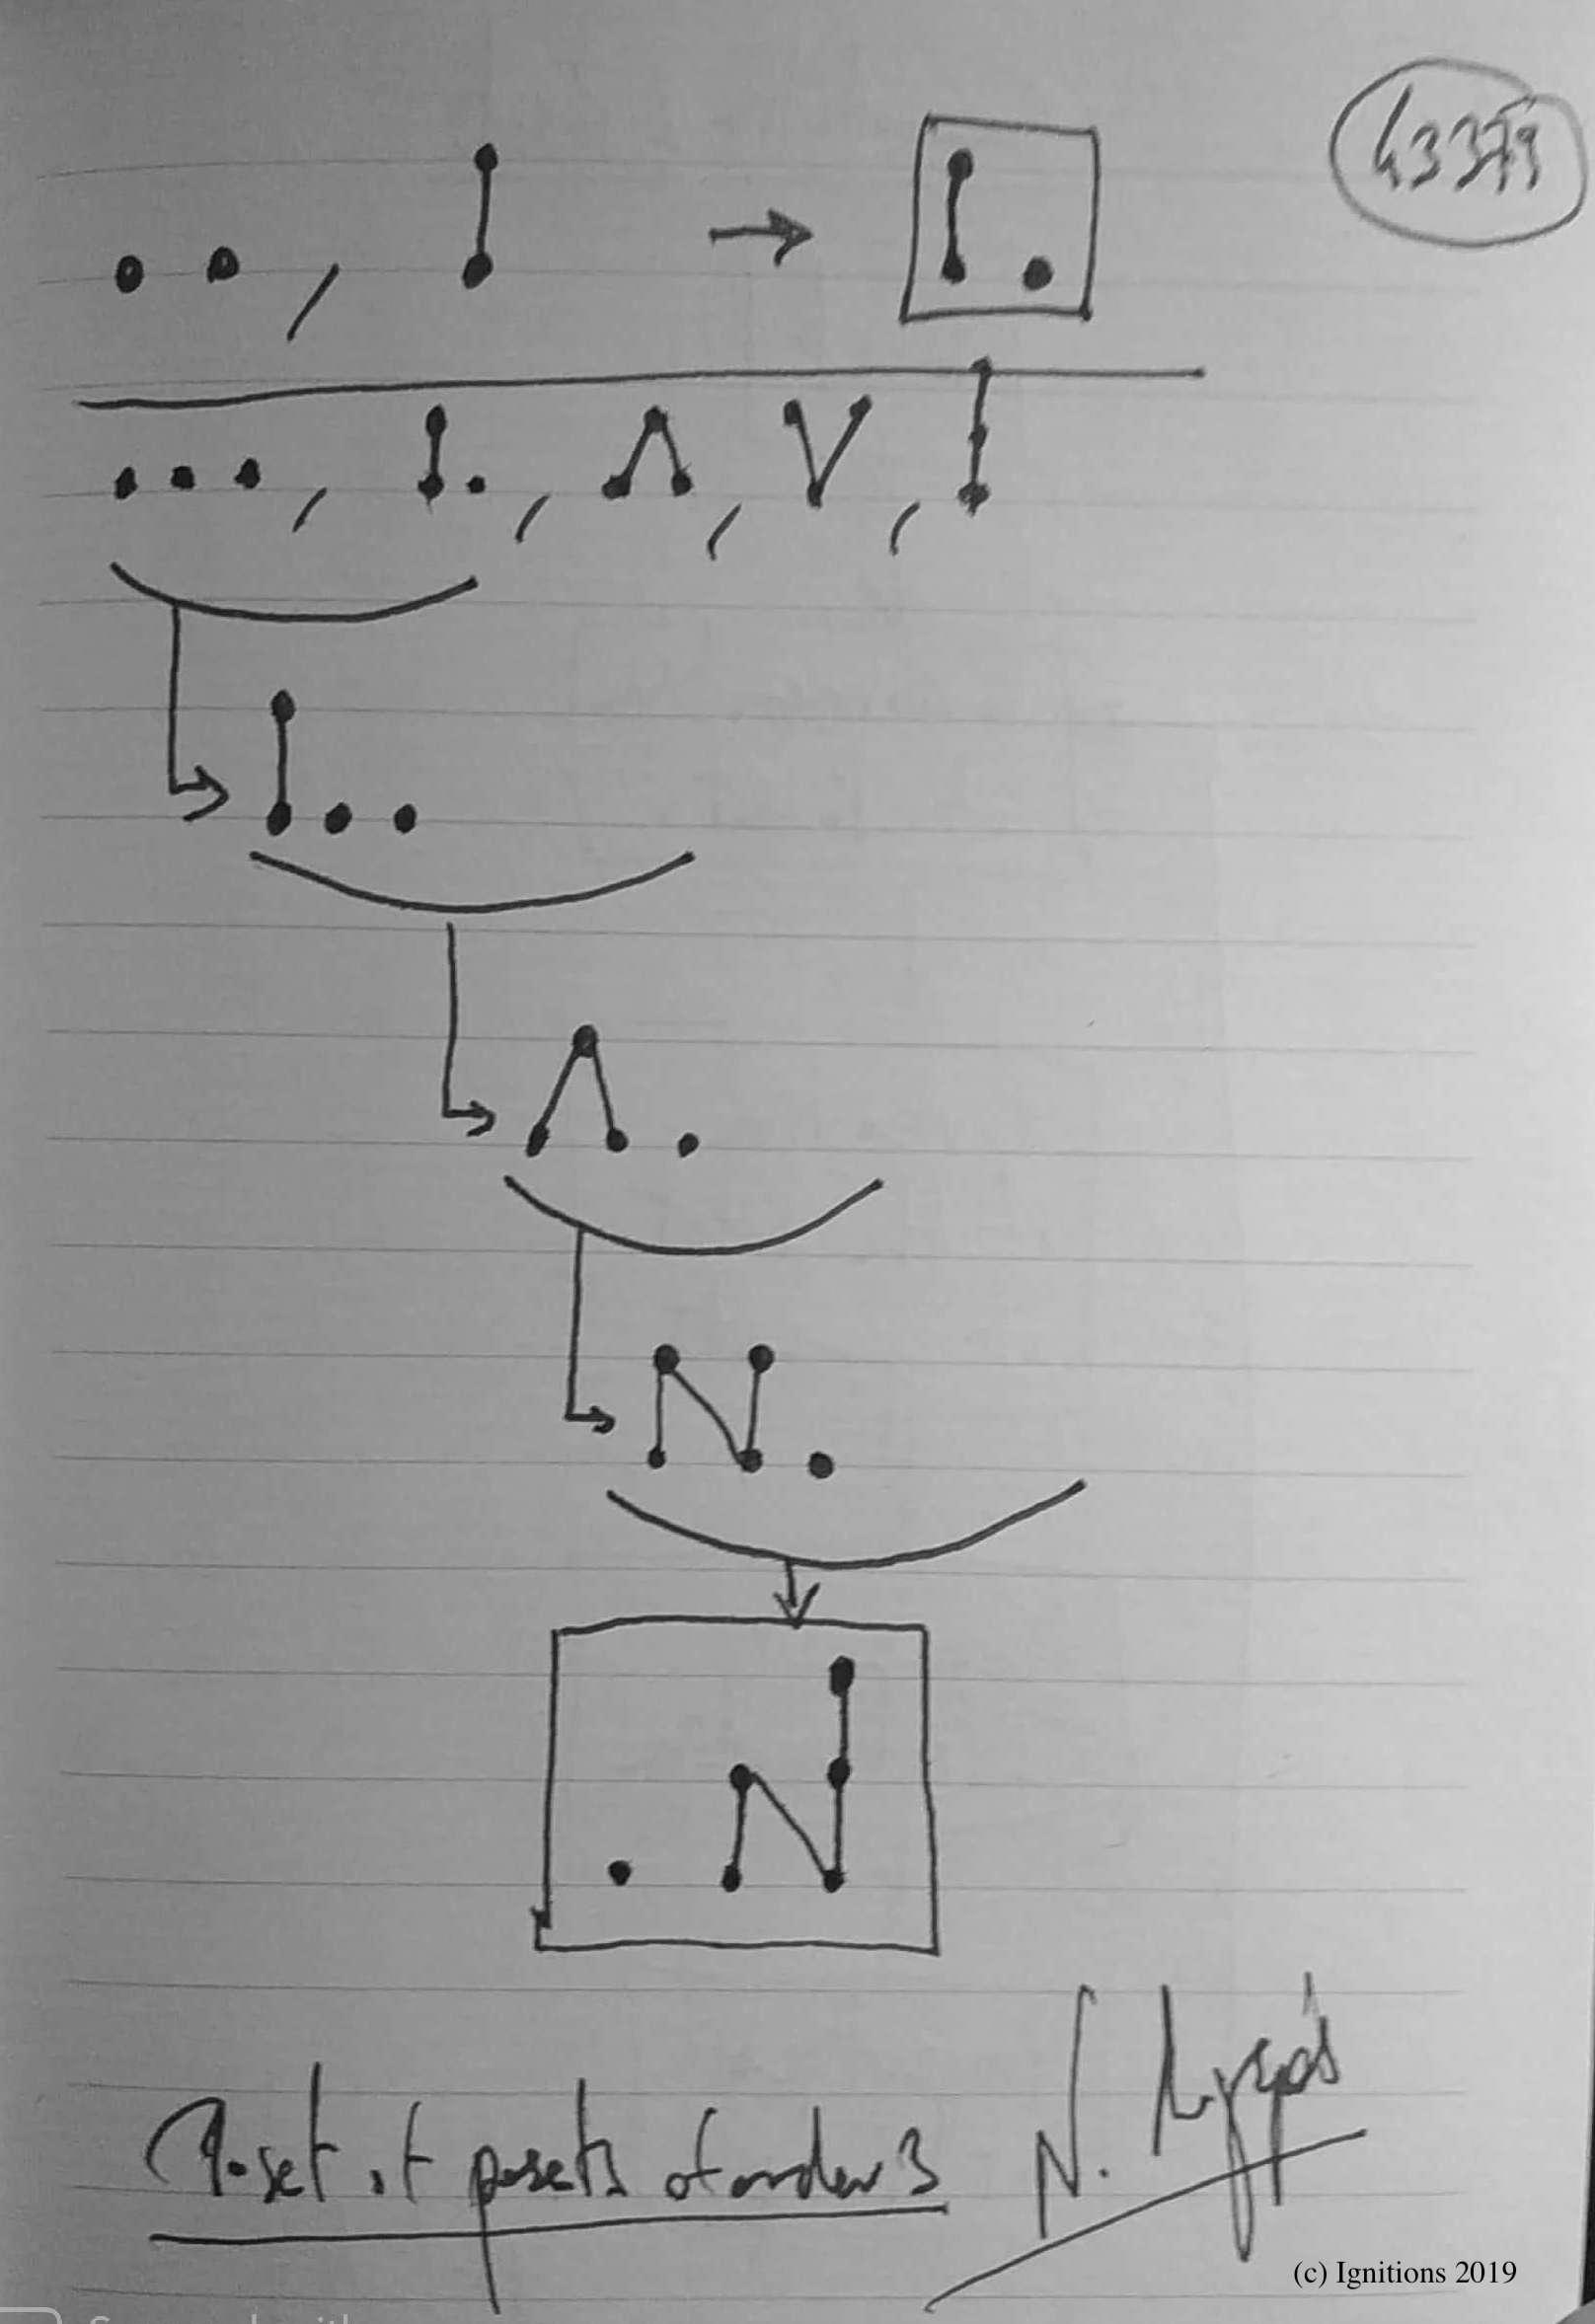 Poset of posets of order 3. (Dessin)